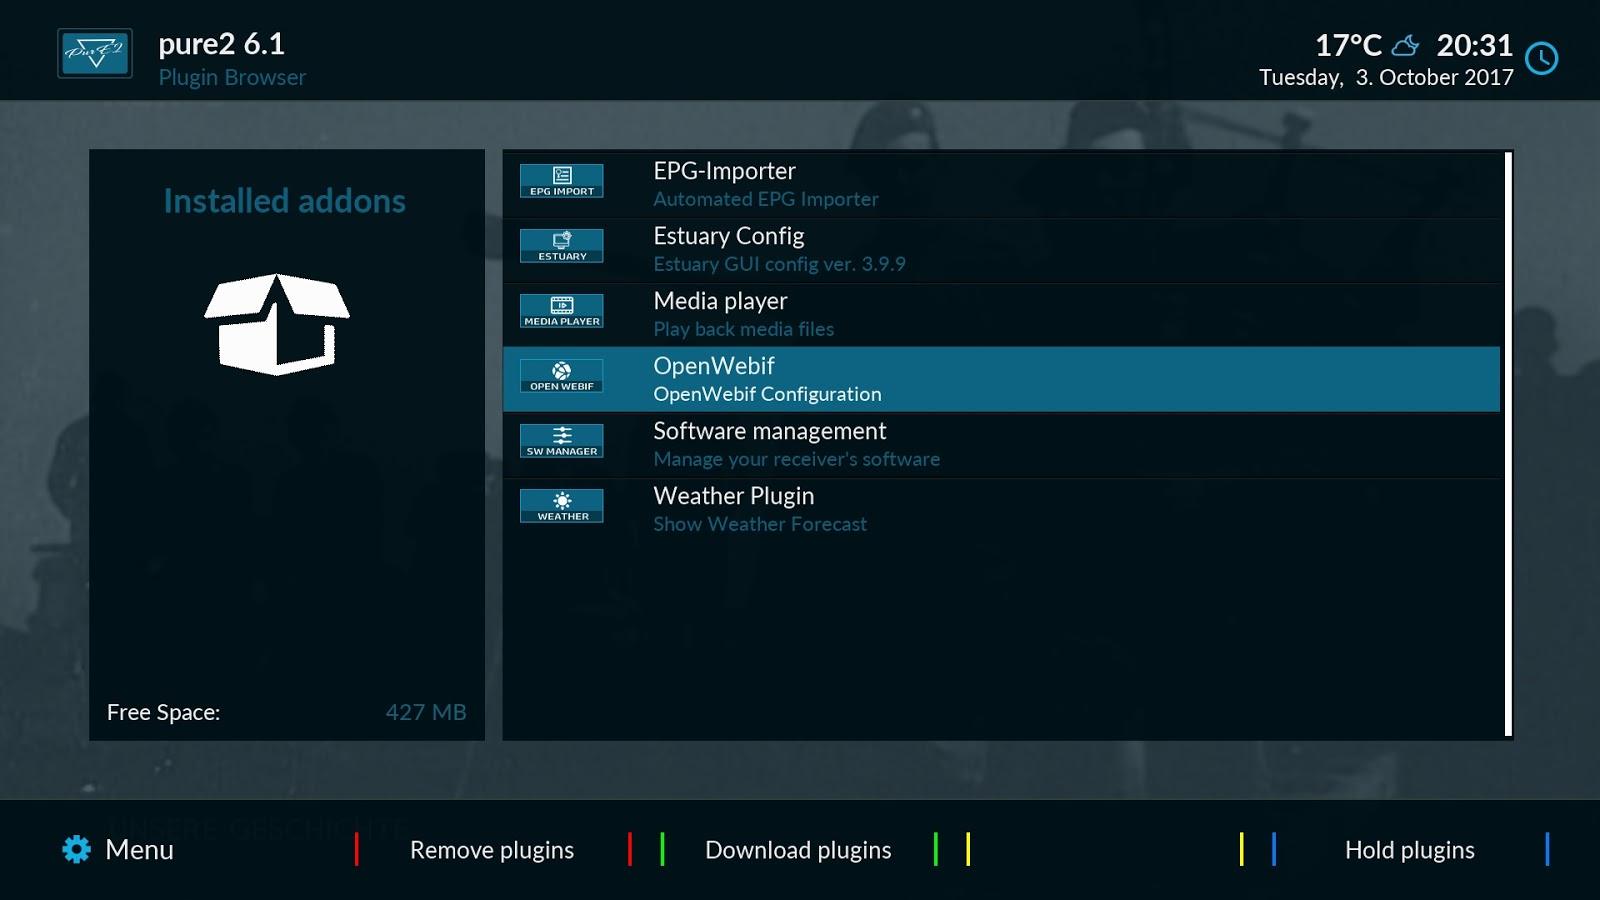 FW E2: PurE2 V6 2 (15MAR18) - mysatbox tv